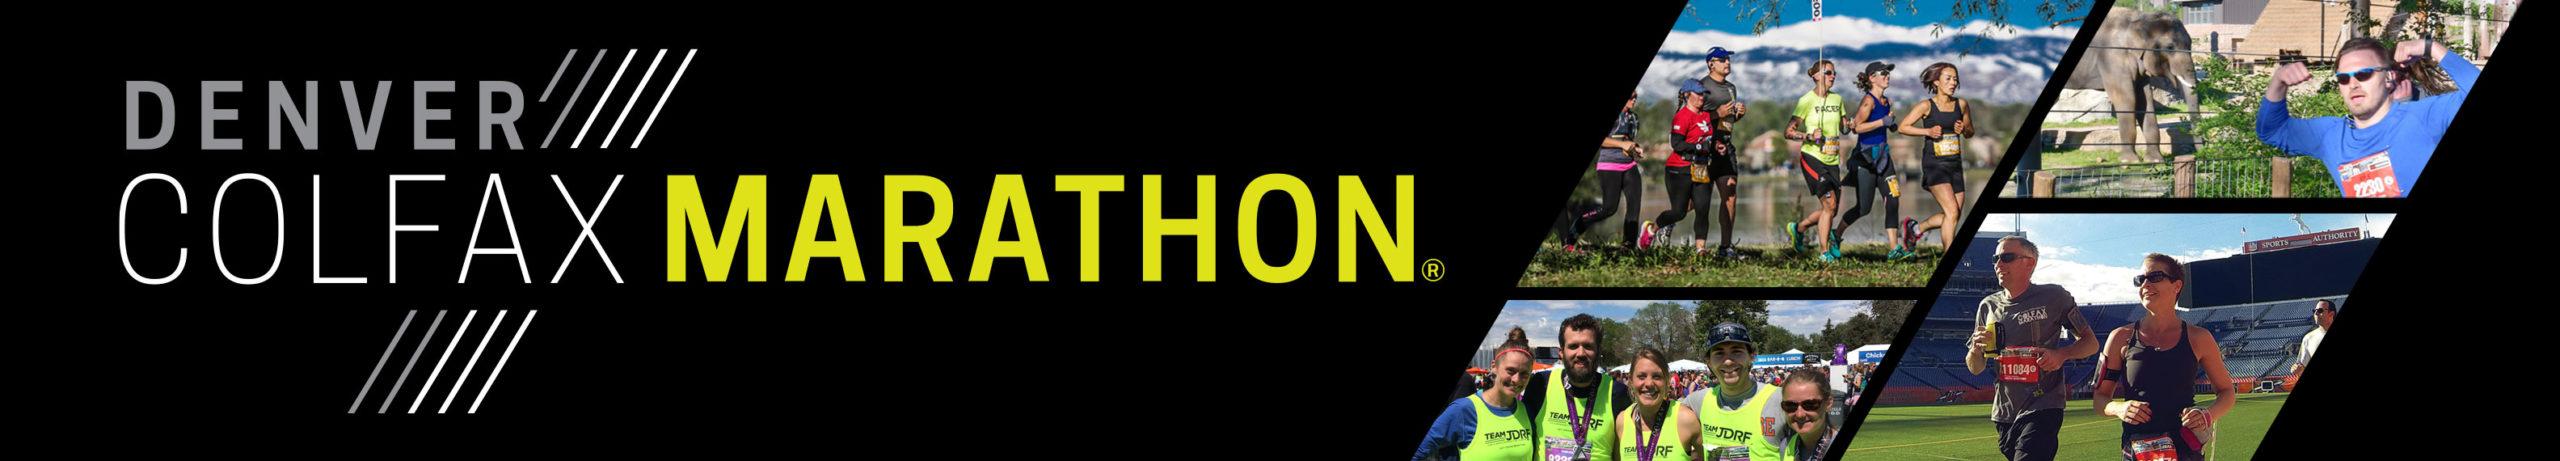 Melissa Nix will be running the Colfax half marathon on Saturday to connect struggles.